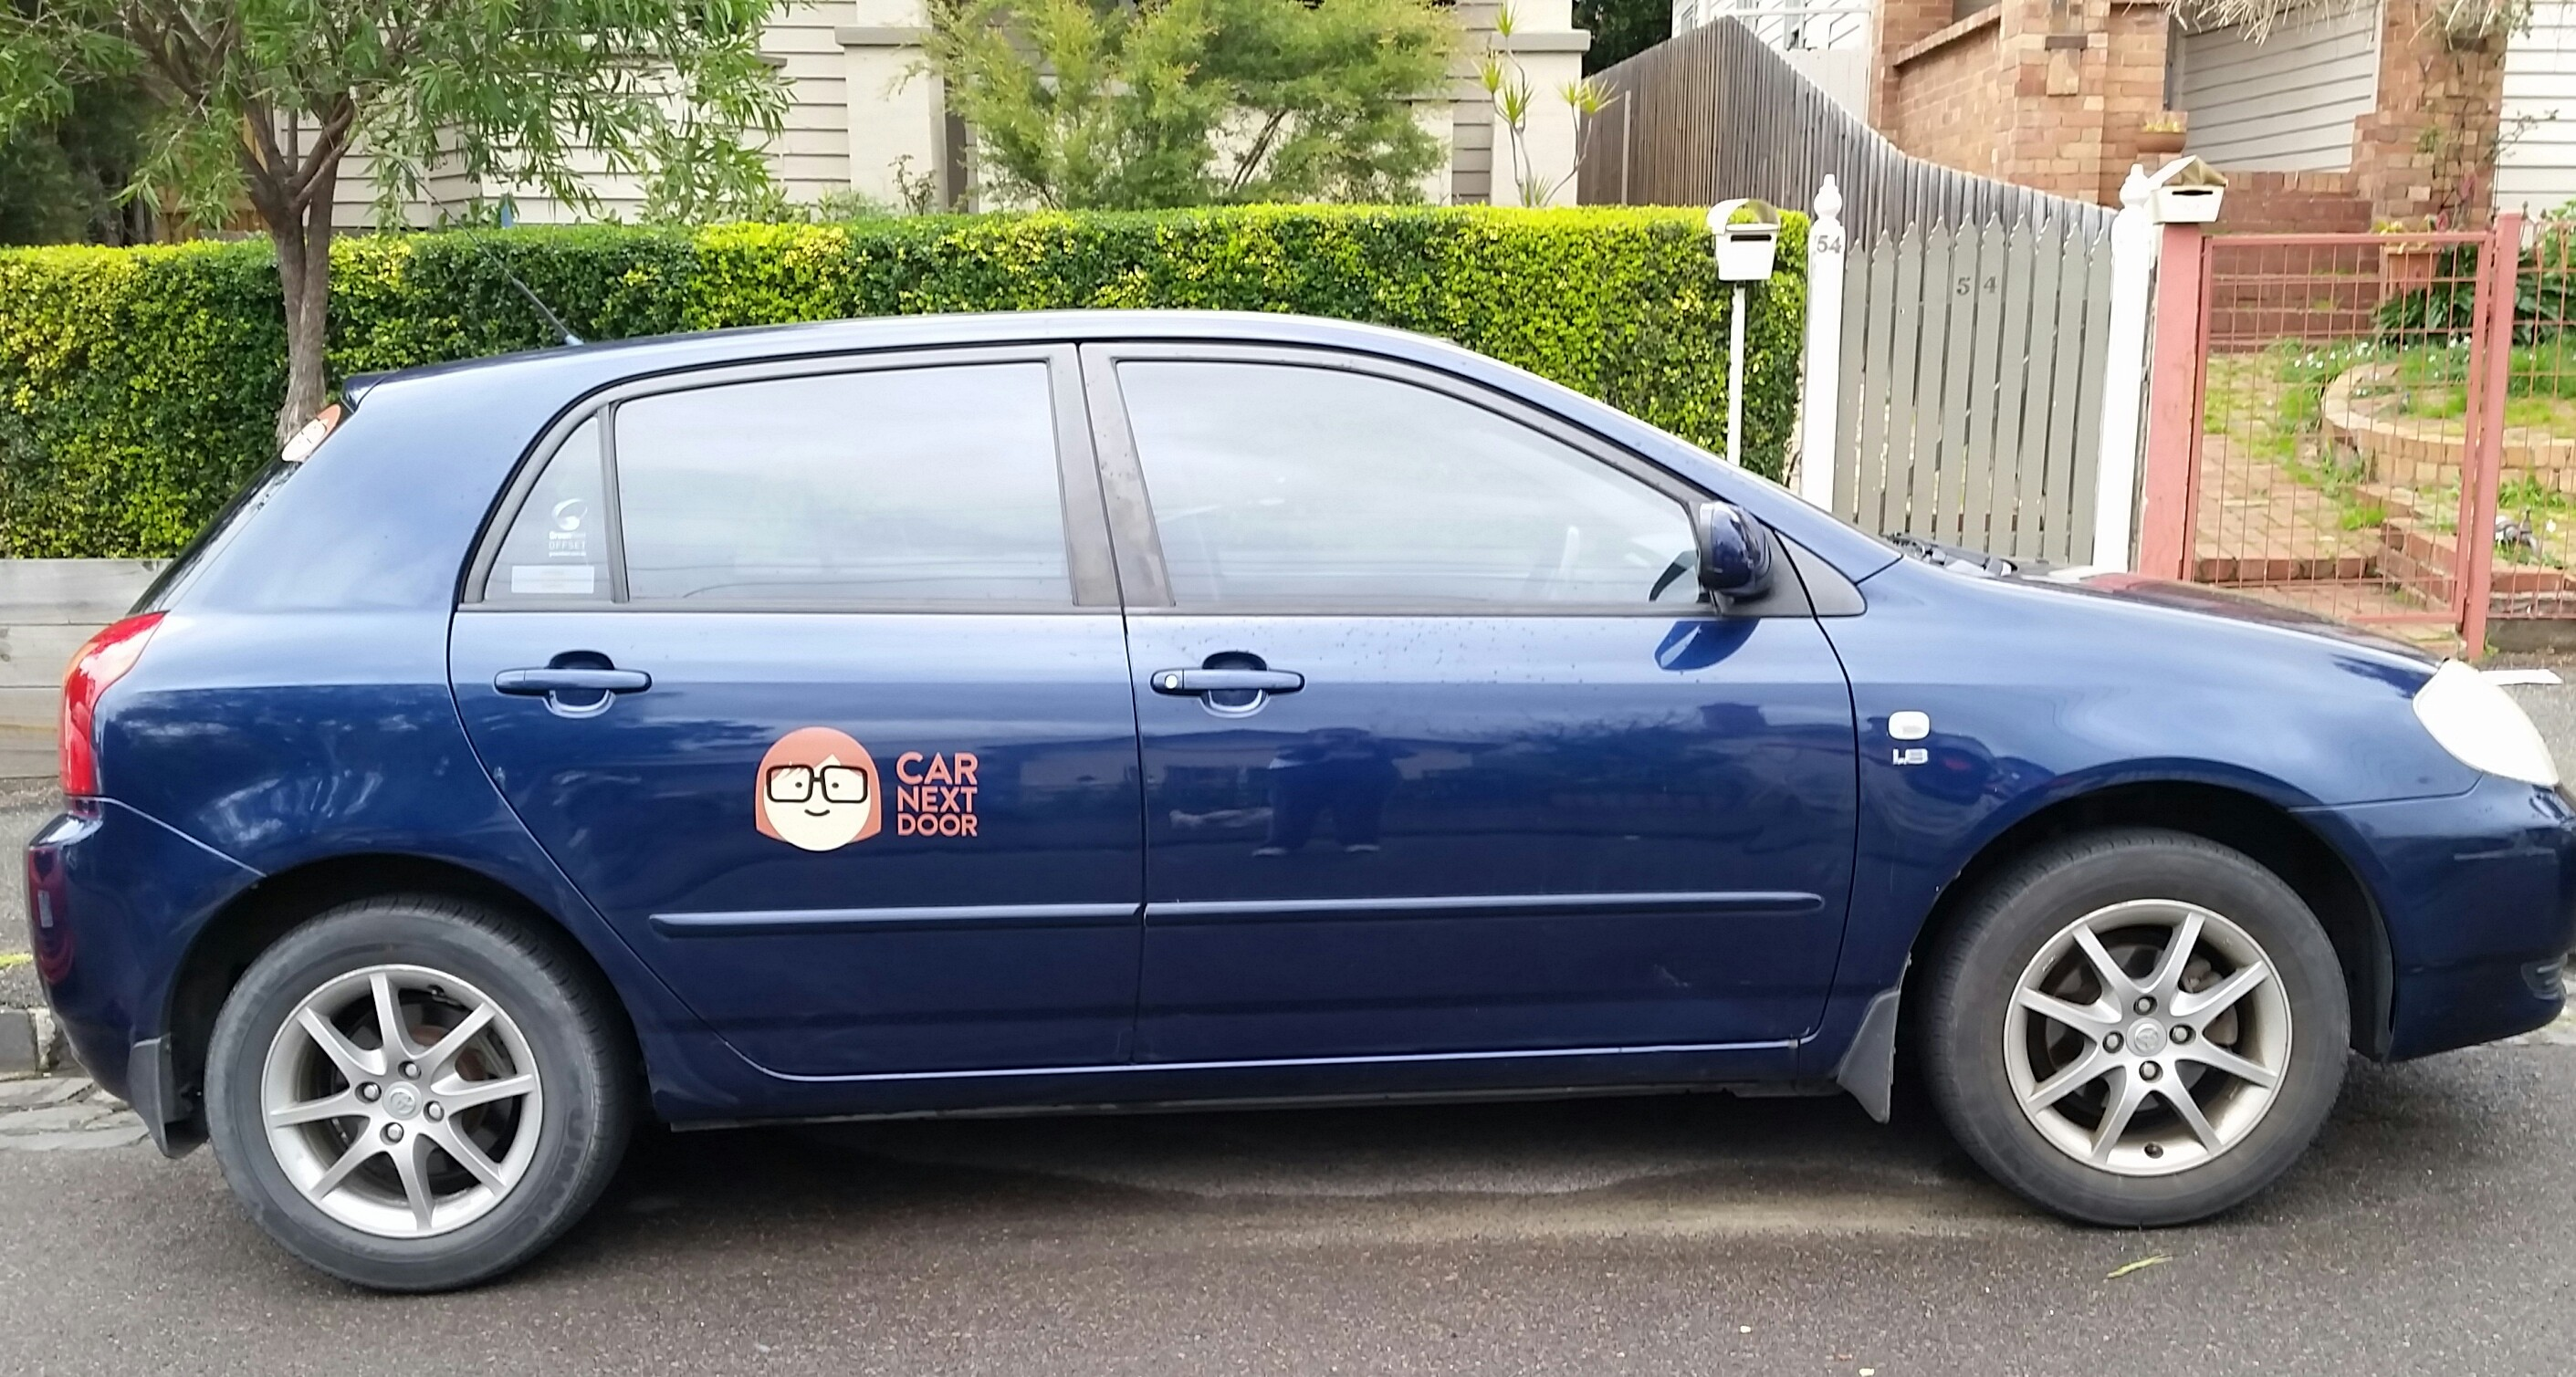 Picture of Andi's 2003 Toyota Corolla